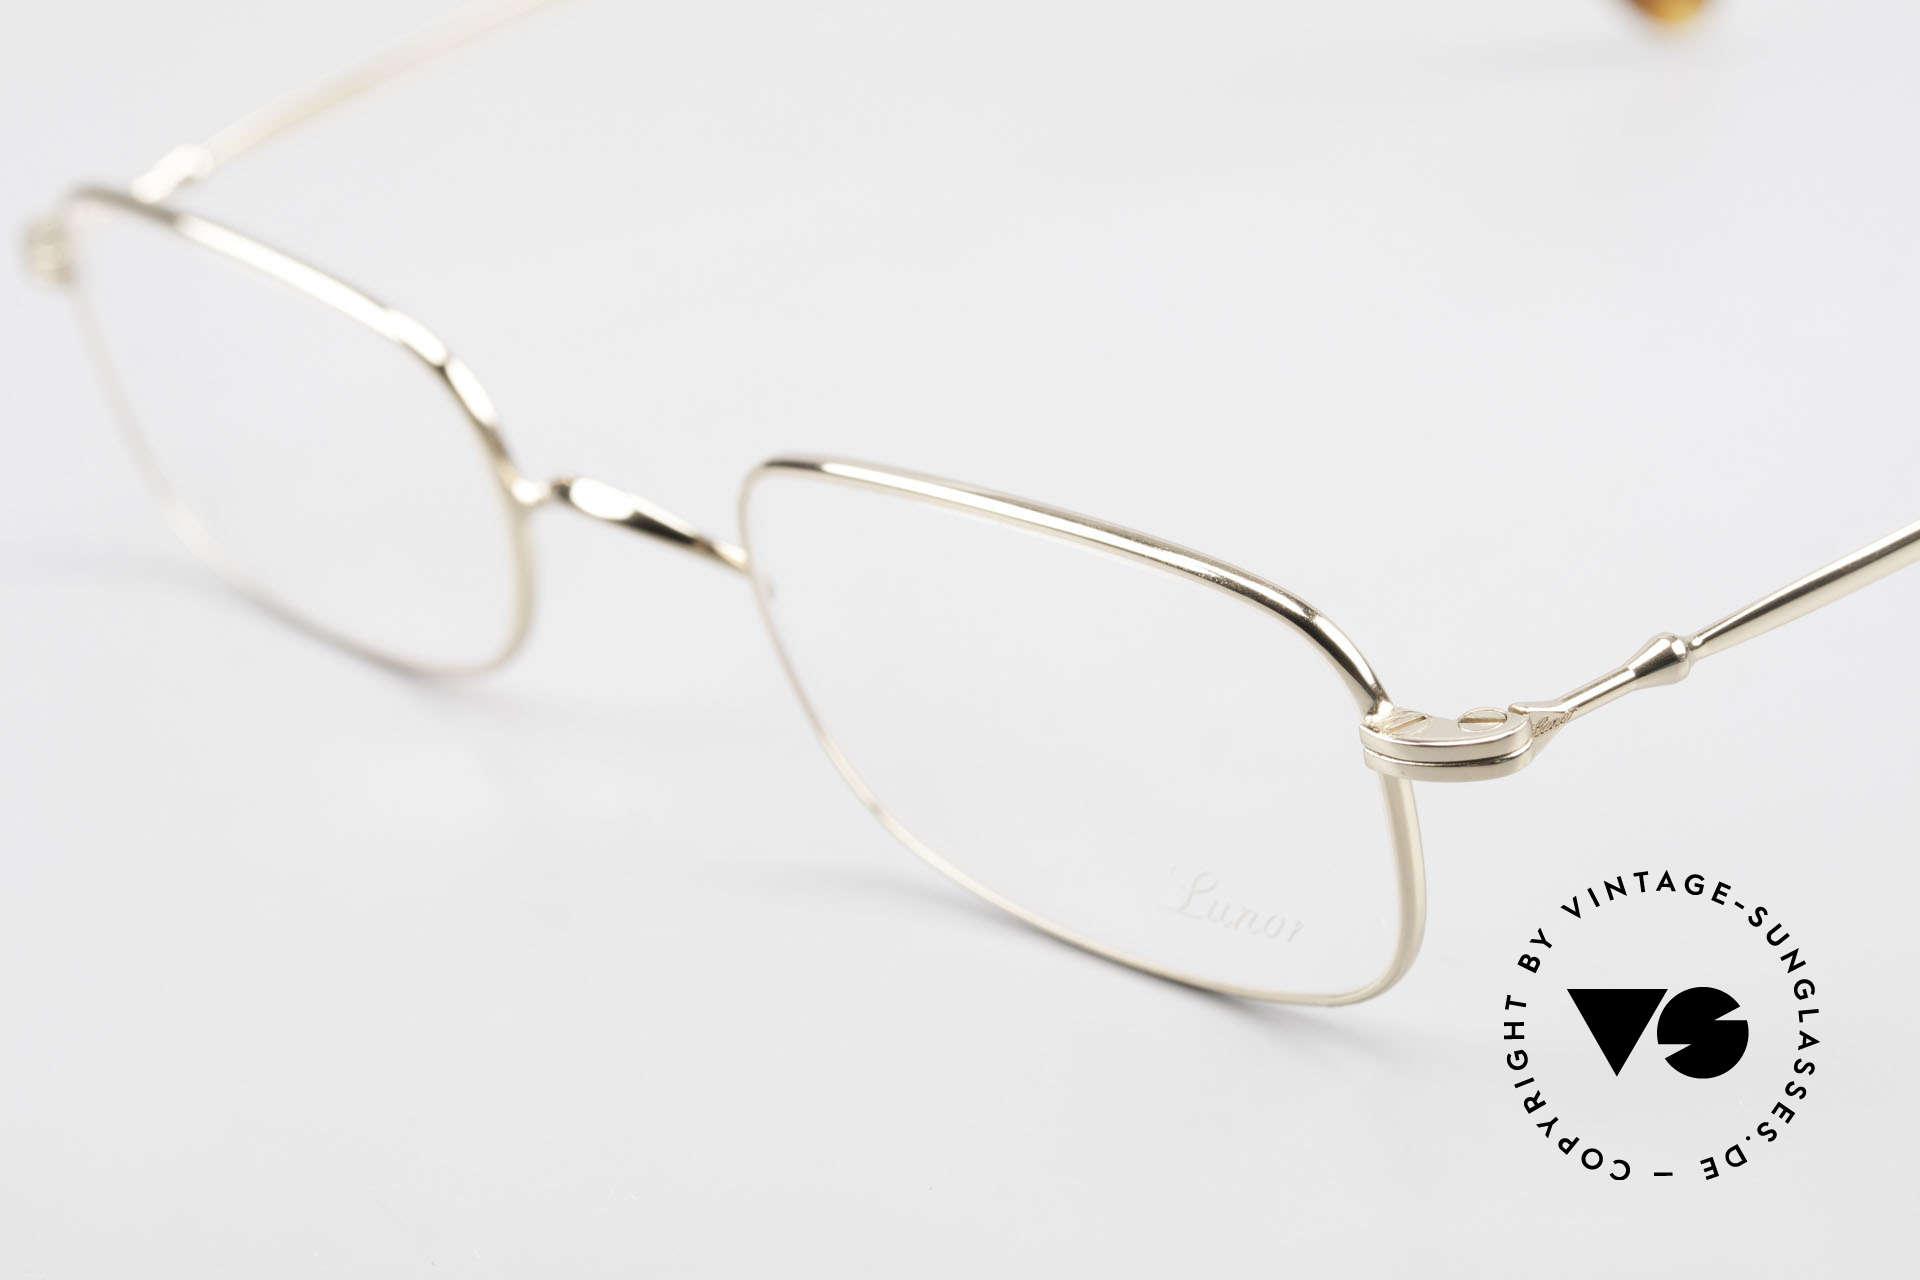 Lunor XV 321 Titanium Frame Gold-Plated, unworn (like all our precious LUNOR eyeglass-frames), Made for Men and Women